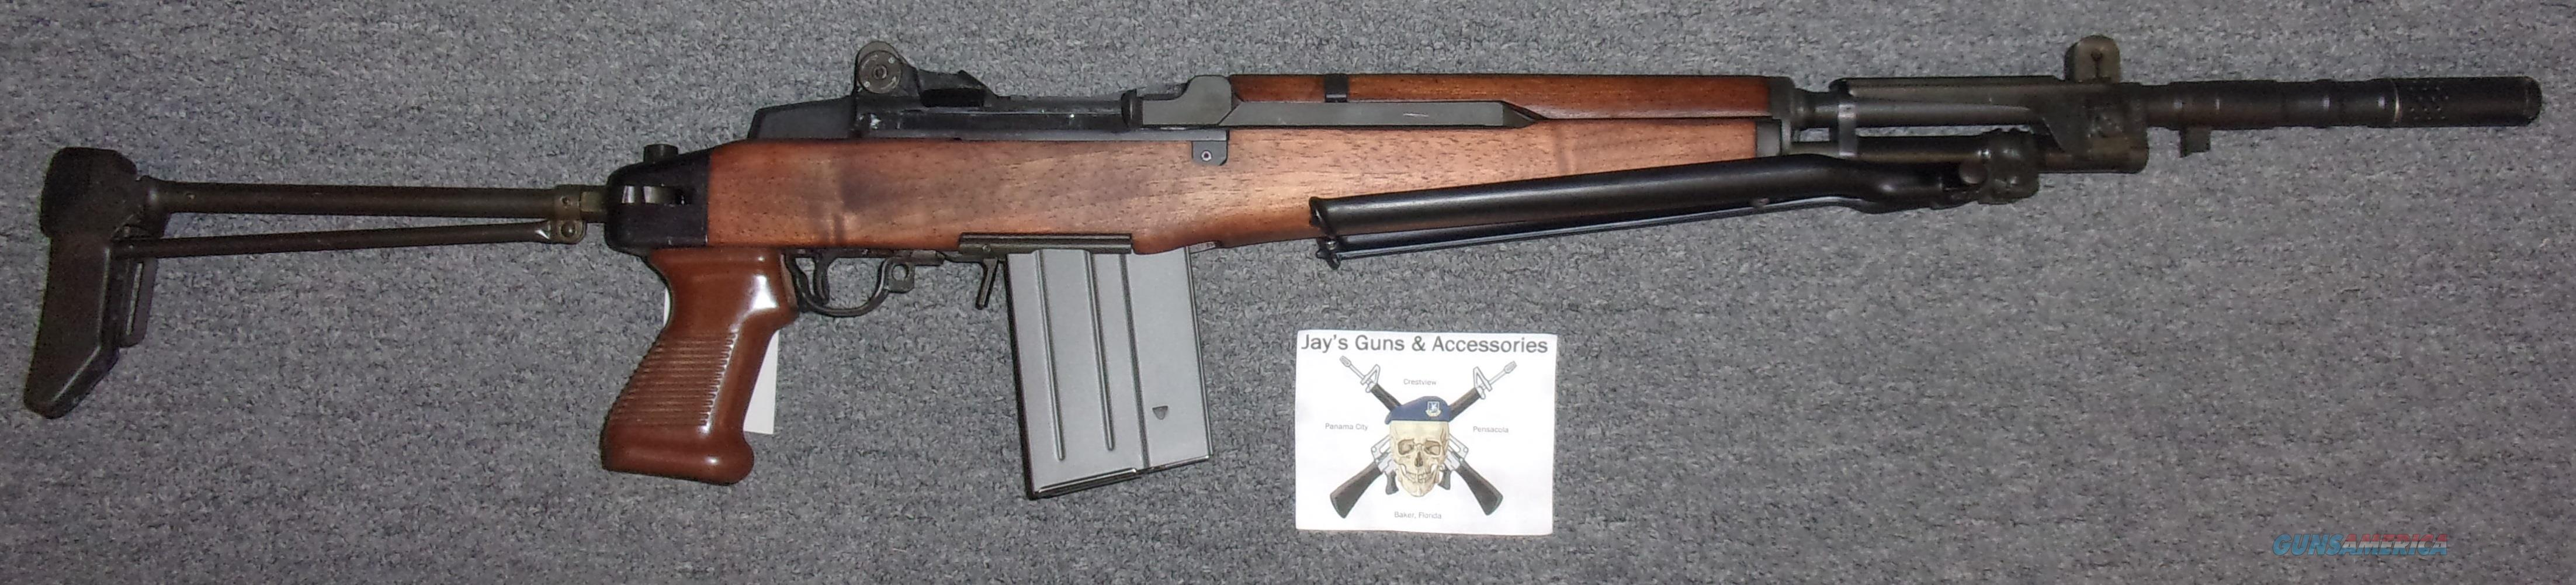 James River Armory BM 59 Paratrooper  Guns > Rifles > Military Misc. Rifles US > M1A/M14